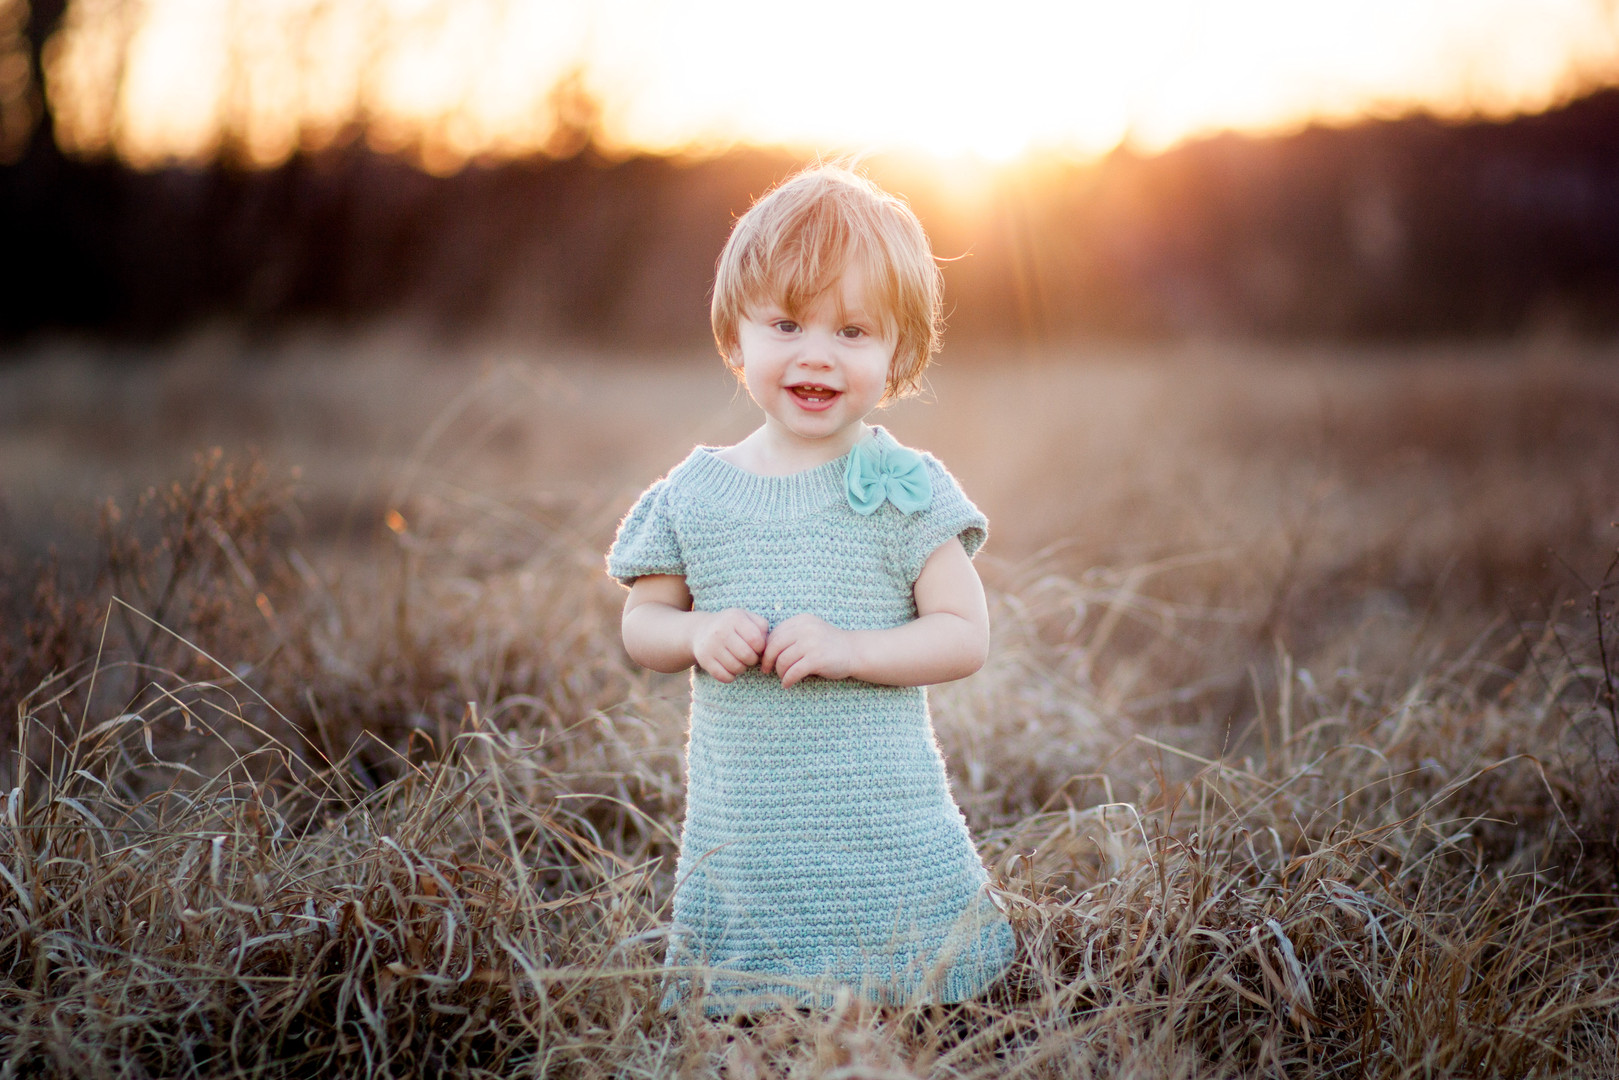 denton child photographer (11).jpg